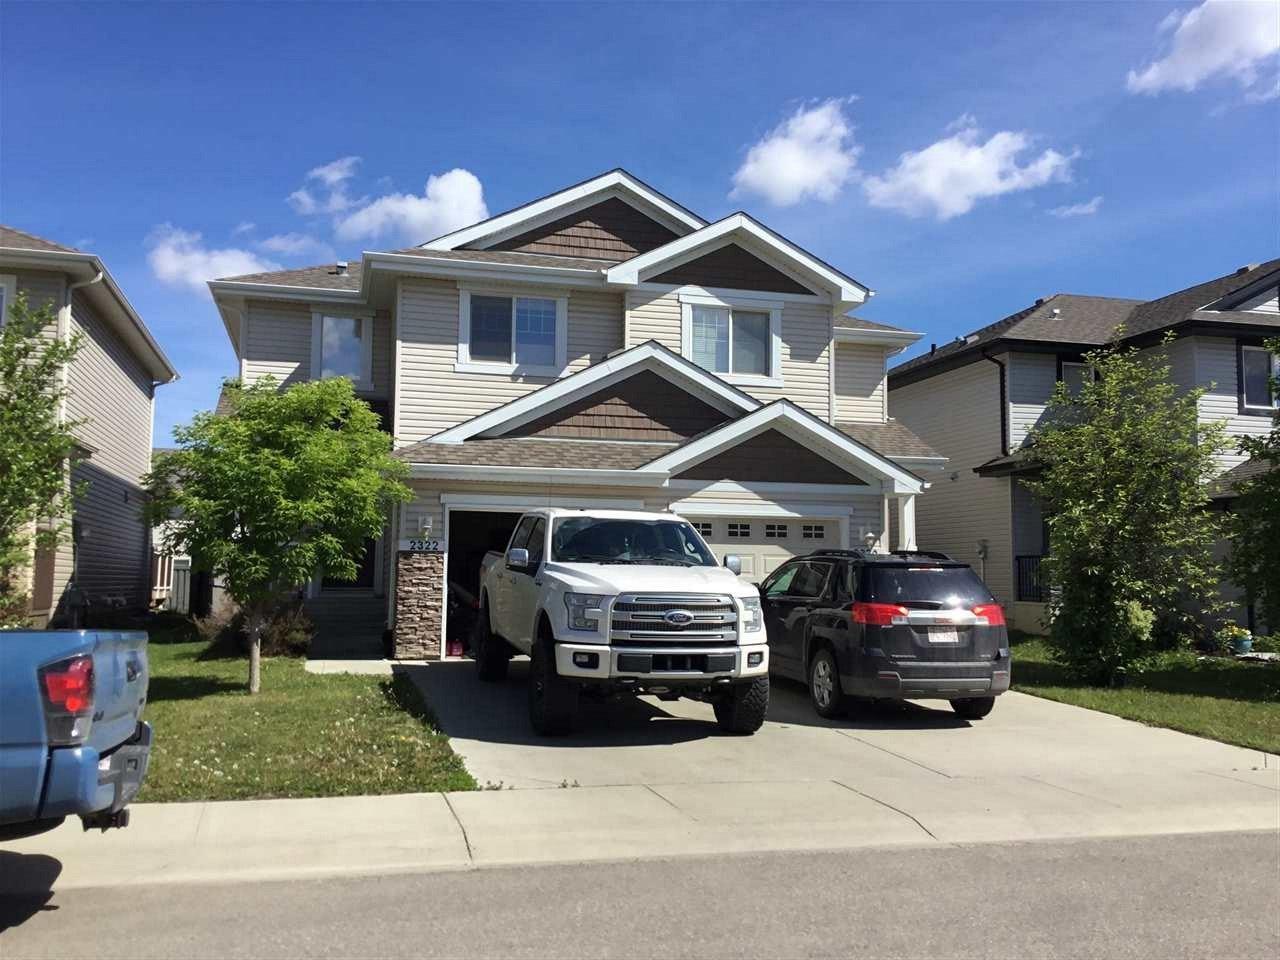 Main Photo: 2320 CASSELMAN Crescent in Edmonton: Zone 55 House Half Duplex for sale : MLS®# E4161908